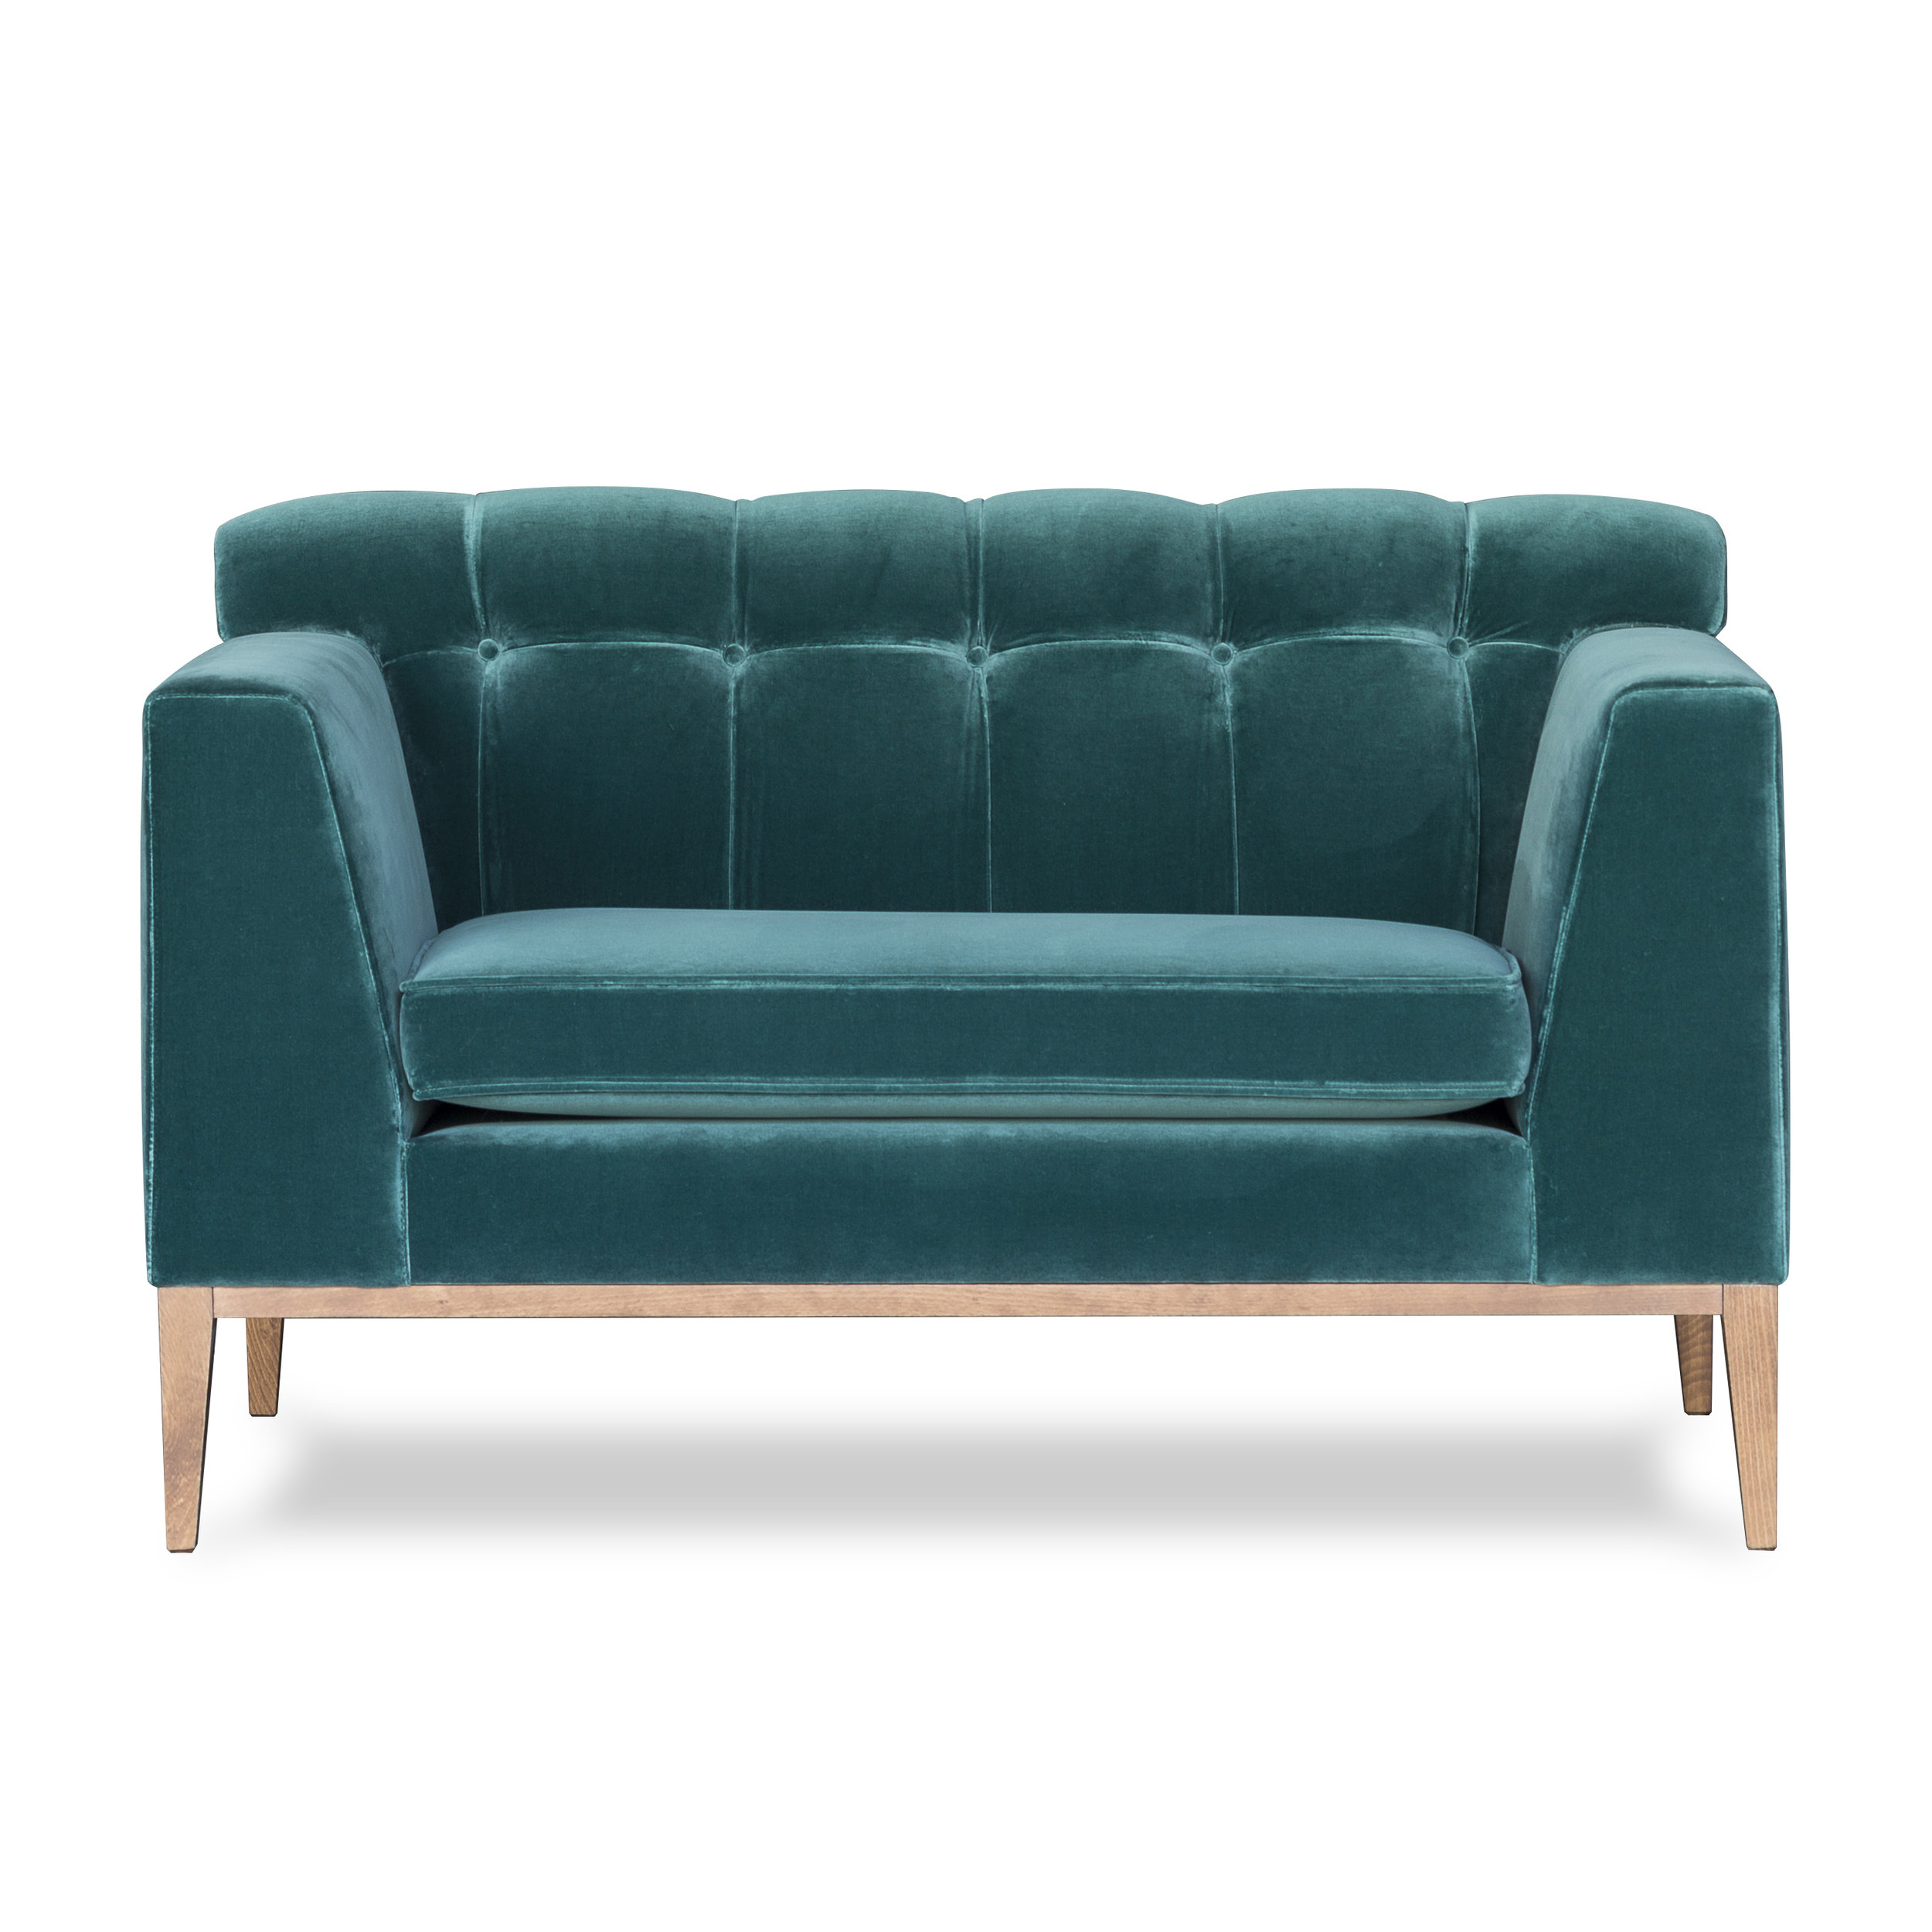 maries-corner-sofa-baker-b.jpg